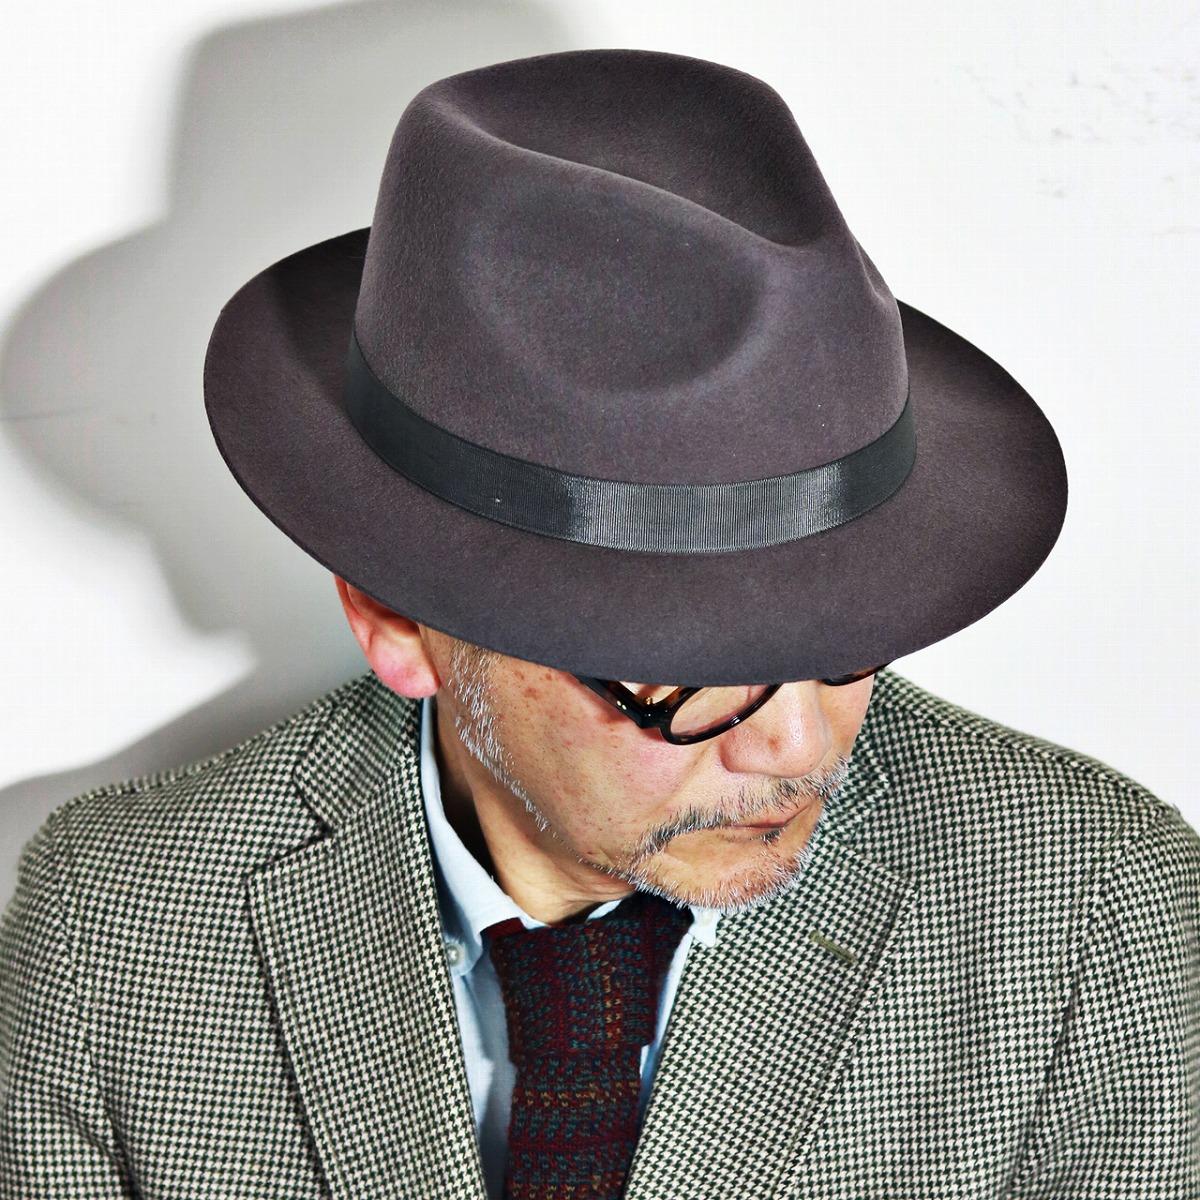 b3416f32417 Christies hat mens cheapstow christys london felt hat autumn winter hat  felt luxury chic jpg 1200x1200